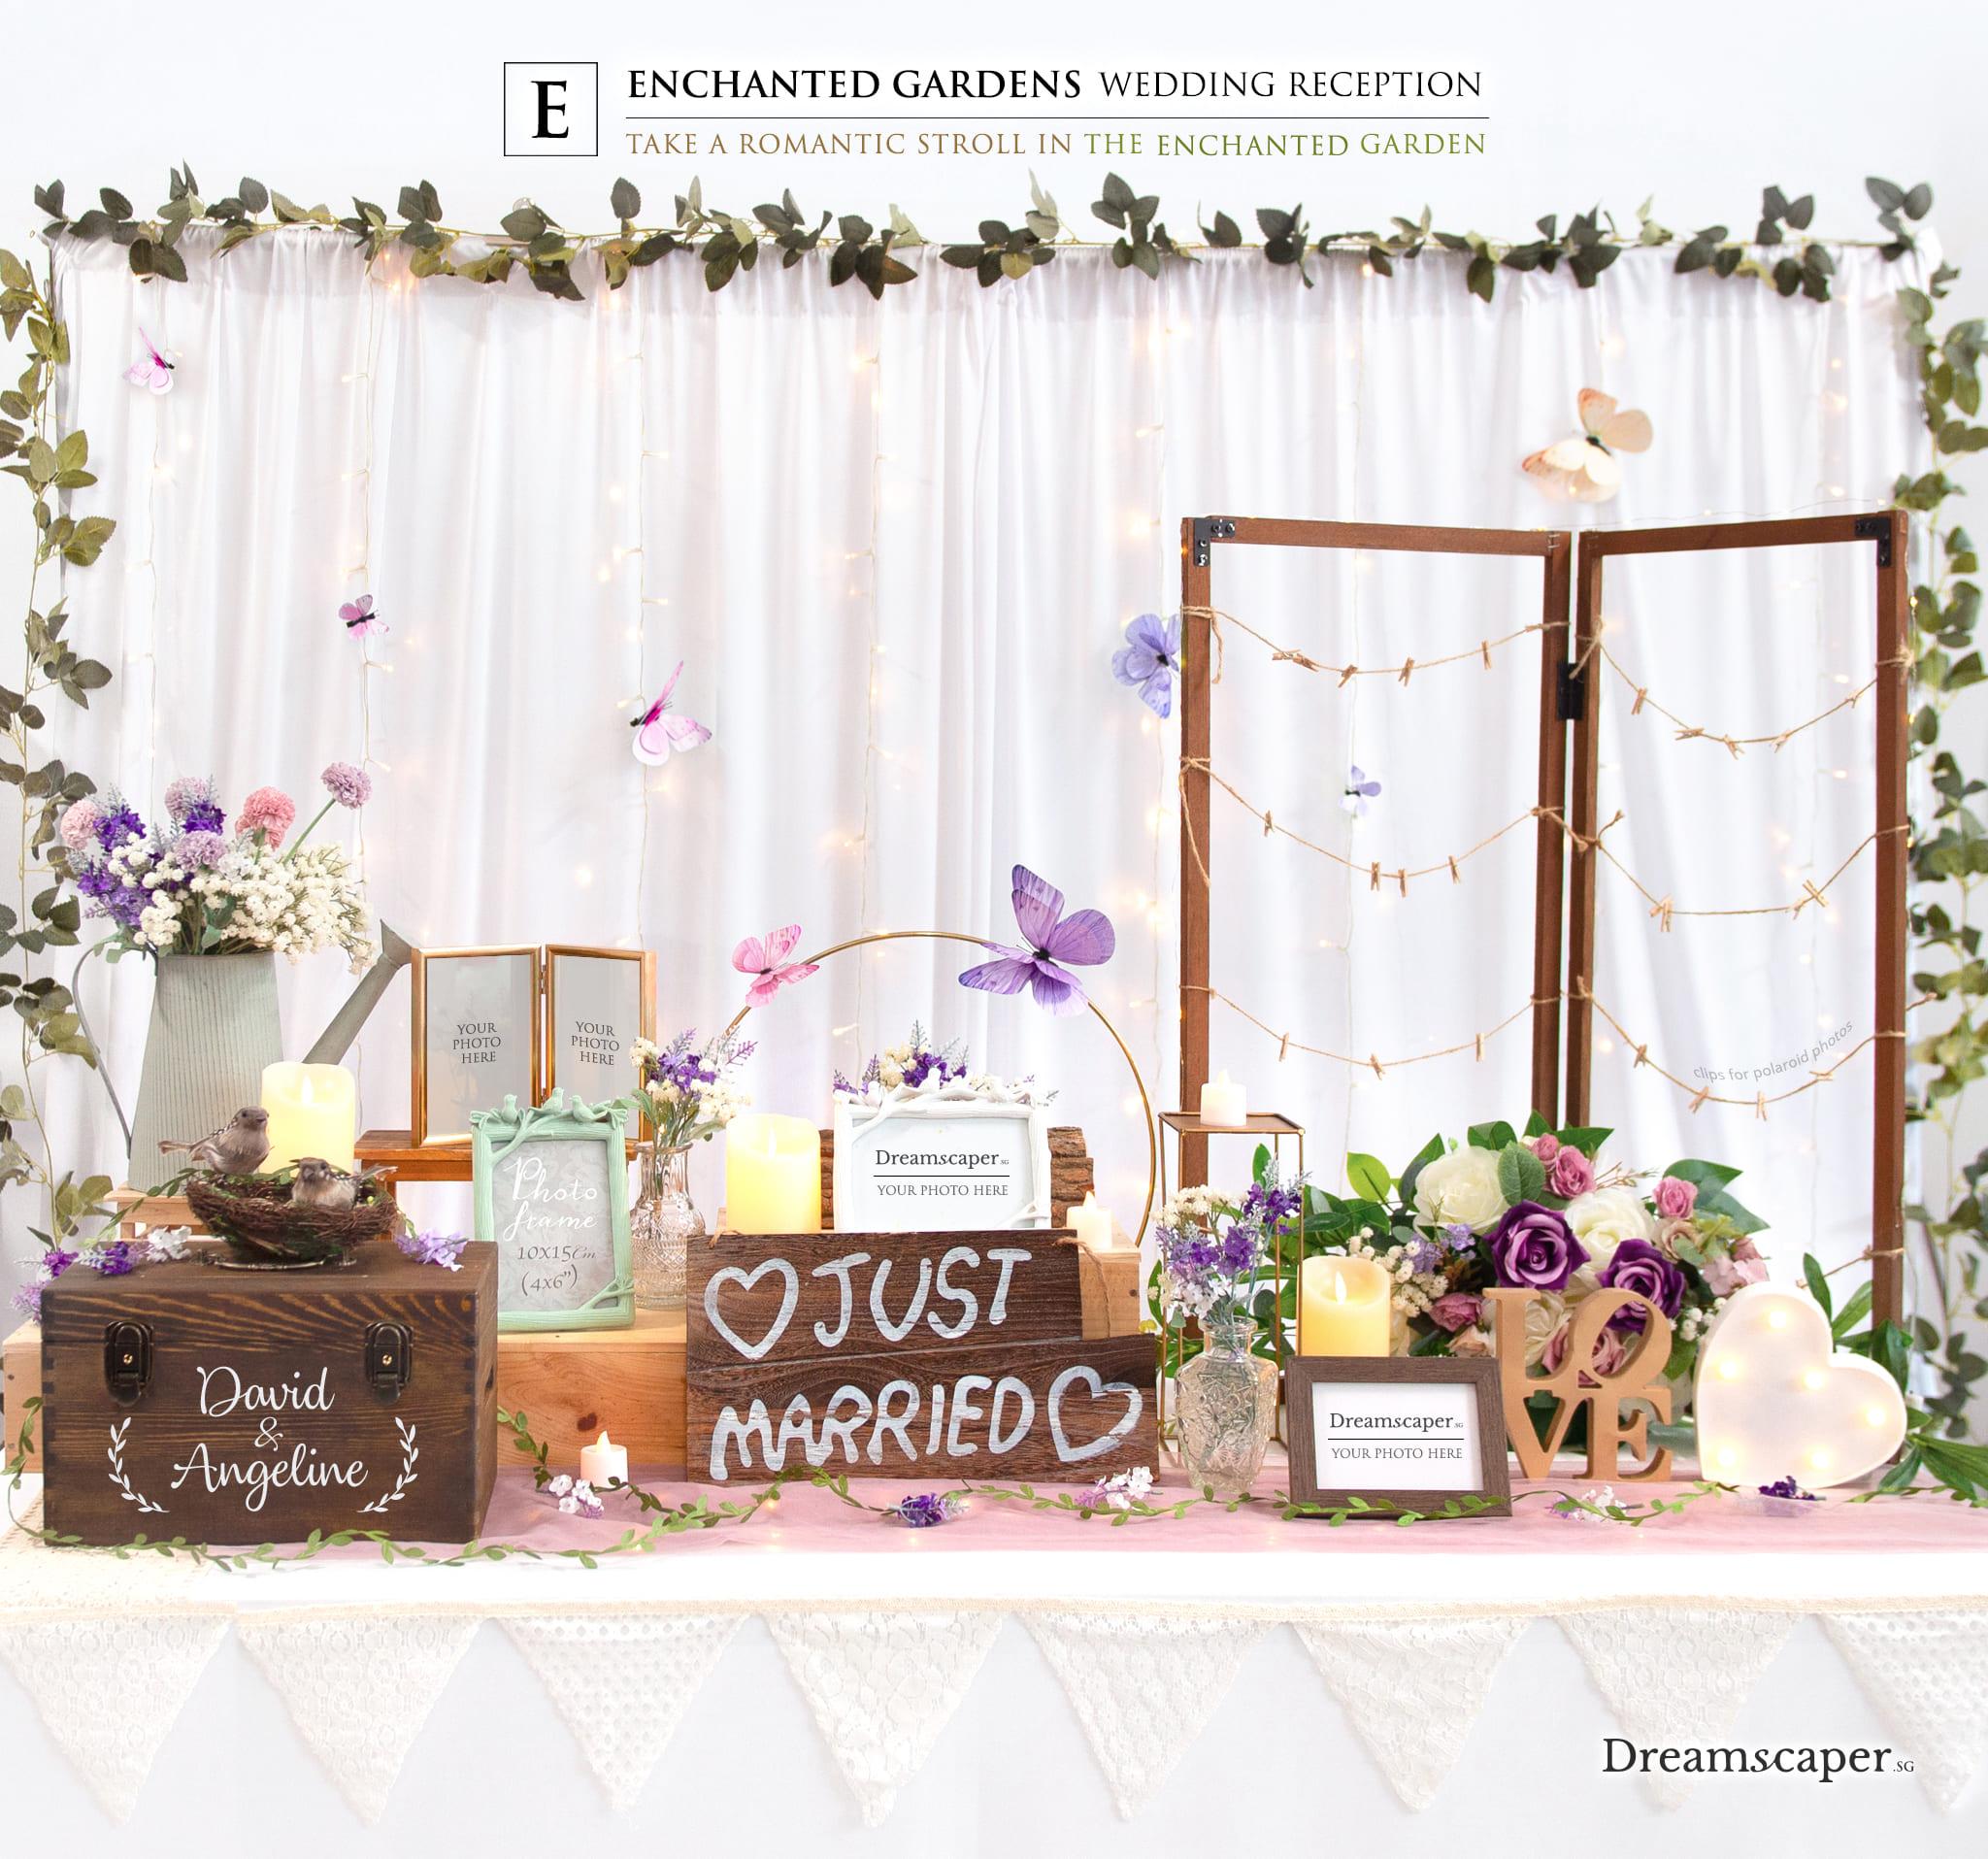 Enchanted Garden Wedding Reception Package Singapore